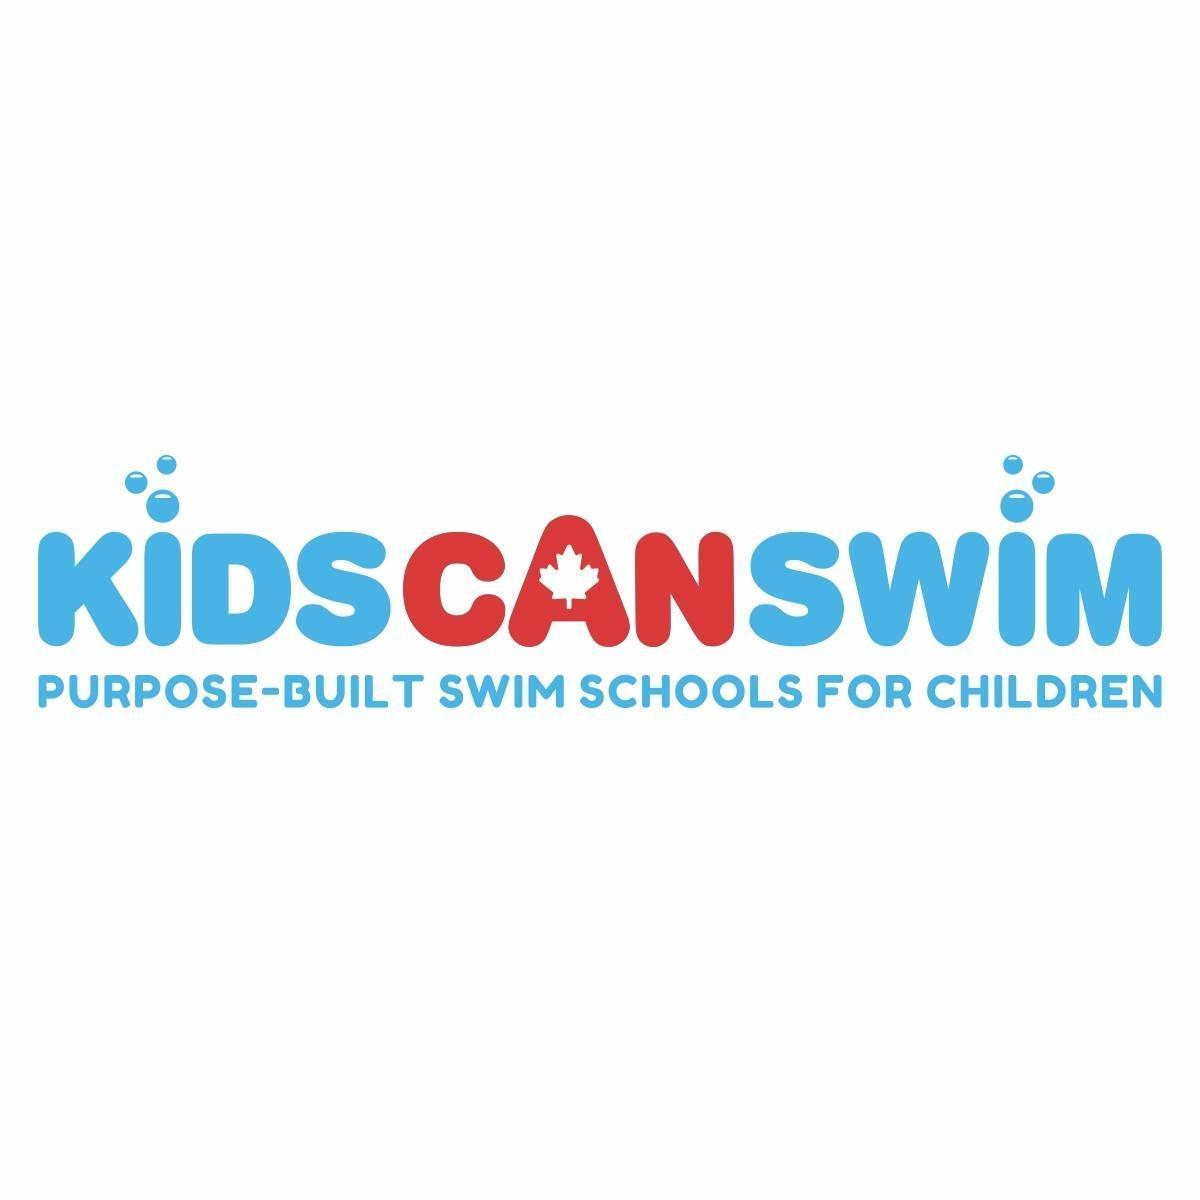 KidsCanSwim